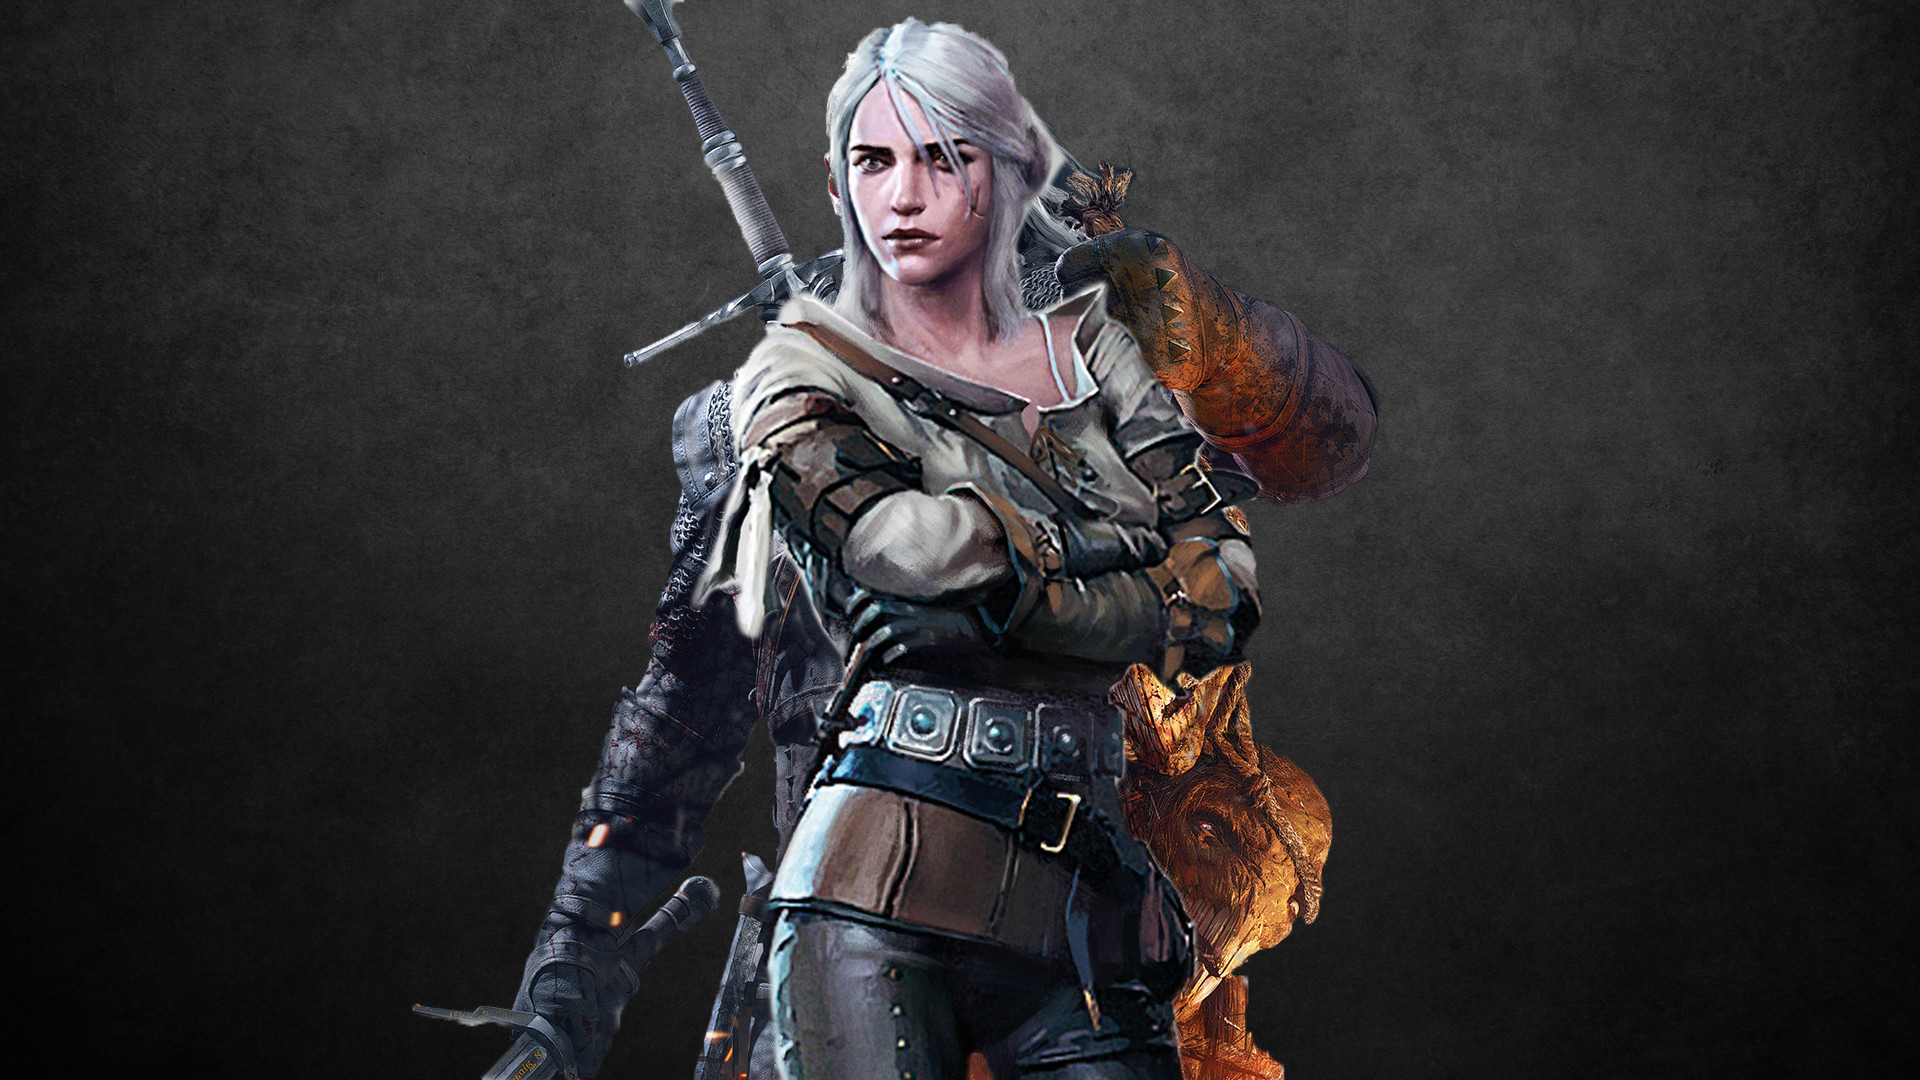 Geralt Ciri Combo 1080p Wallpaper Made By me   Feedback Greatly 1920x1080